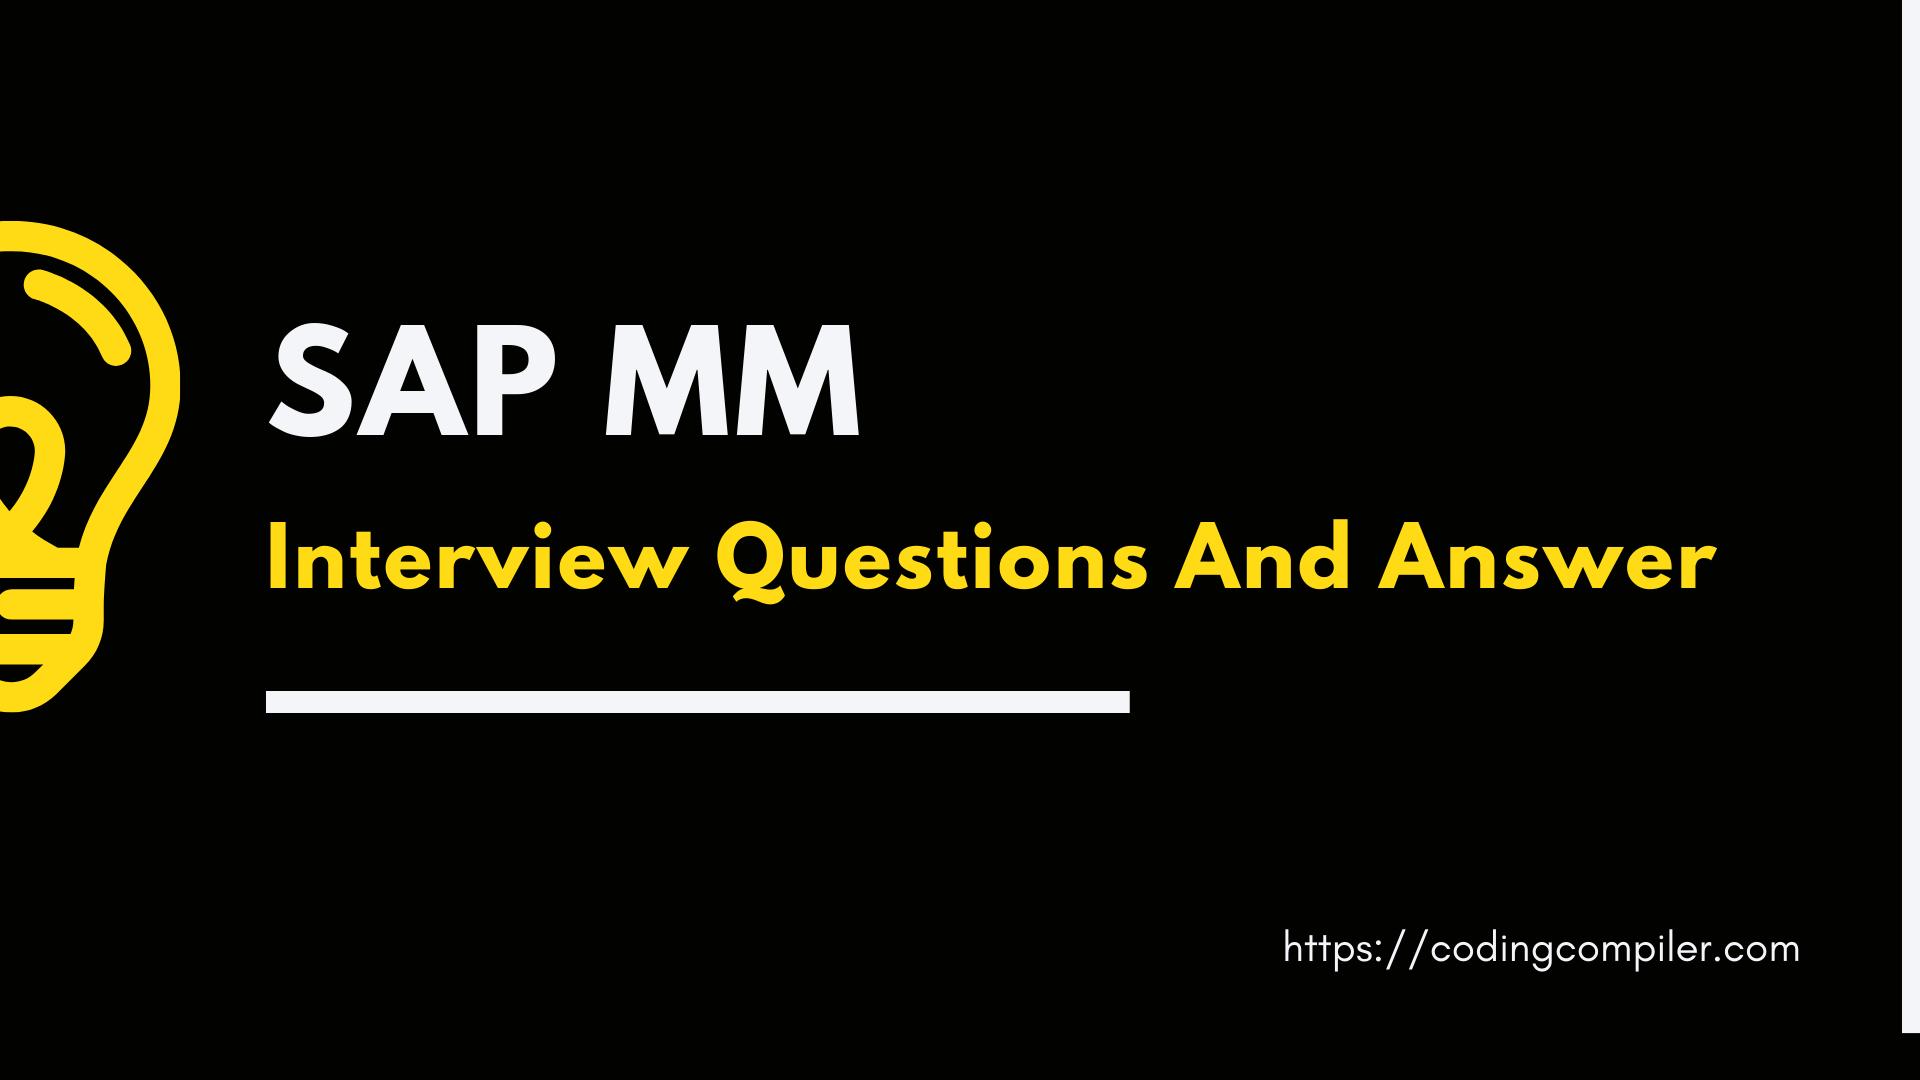 SAP MM Interview Questions